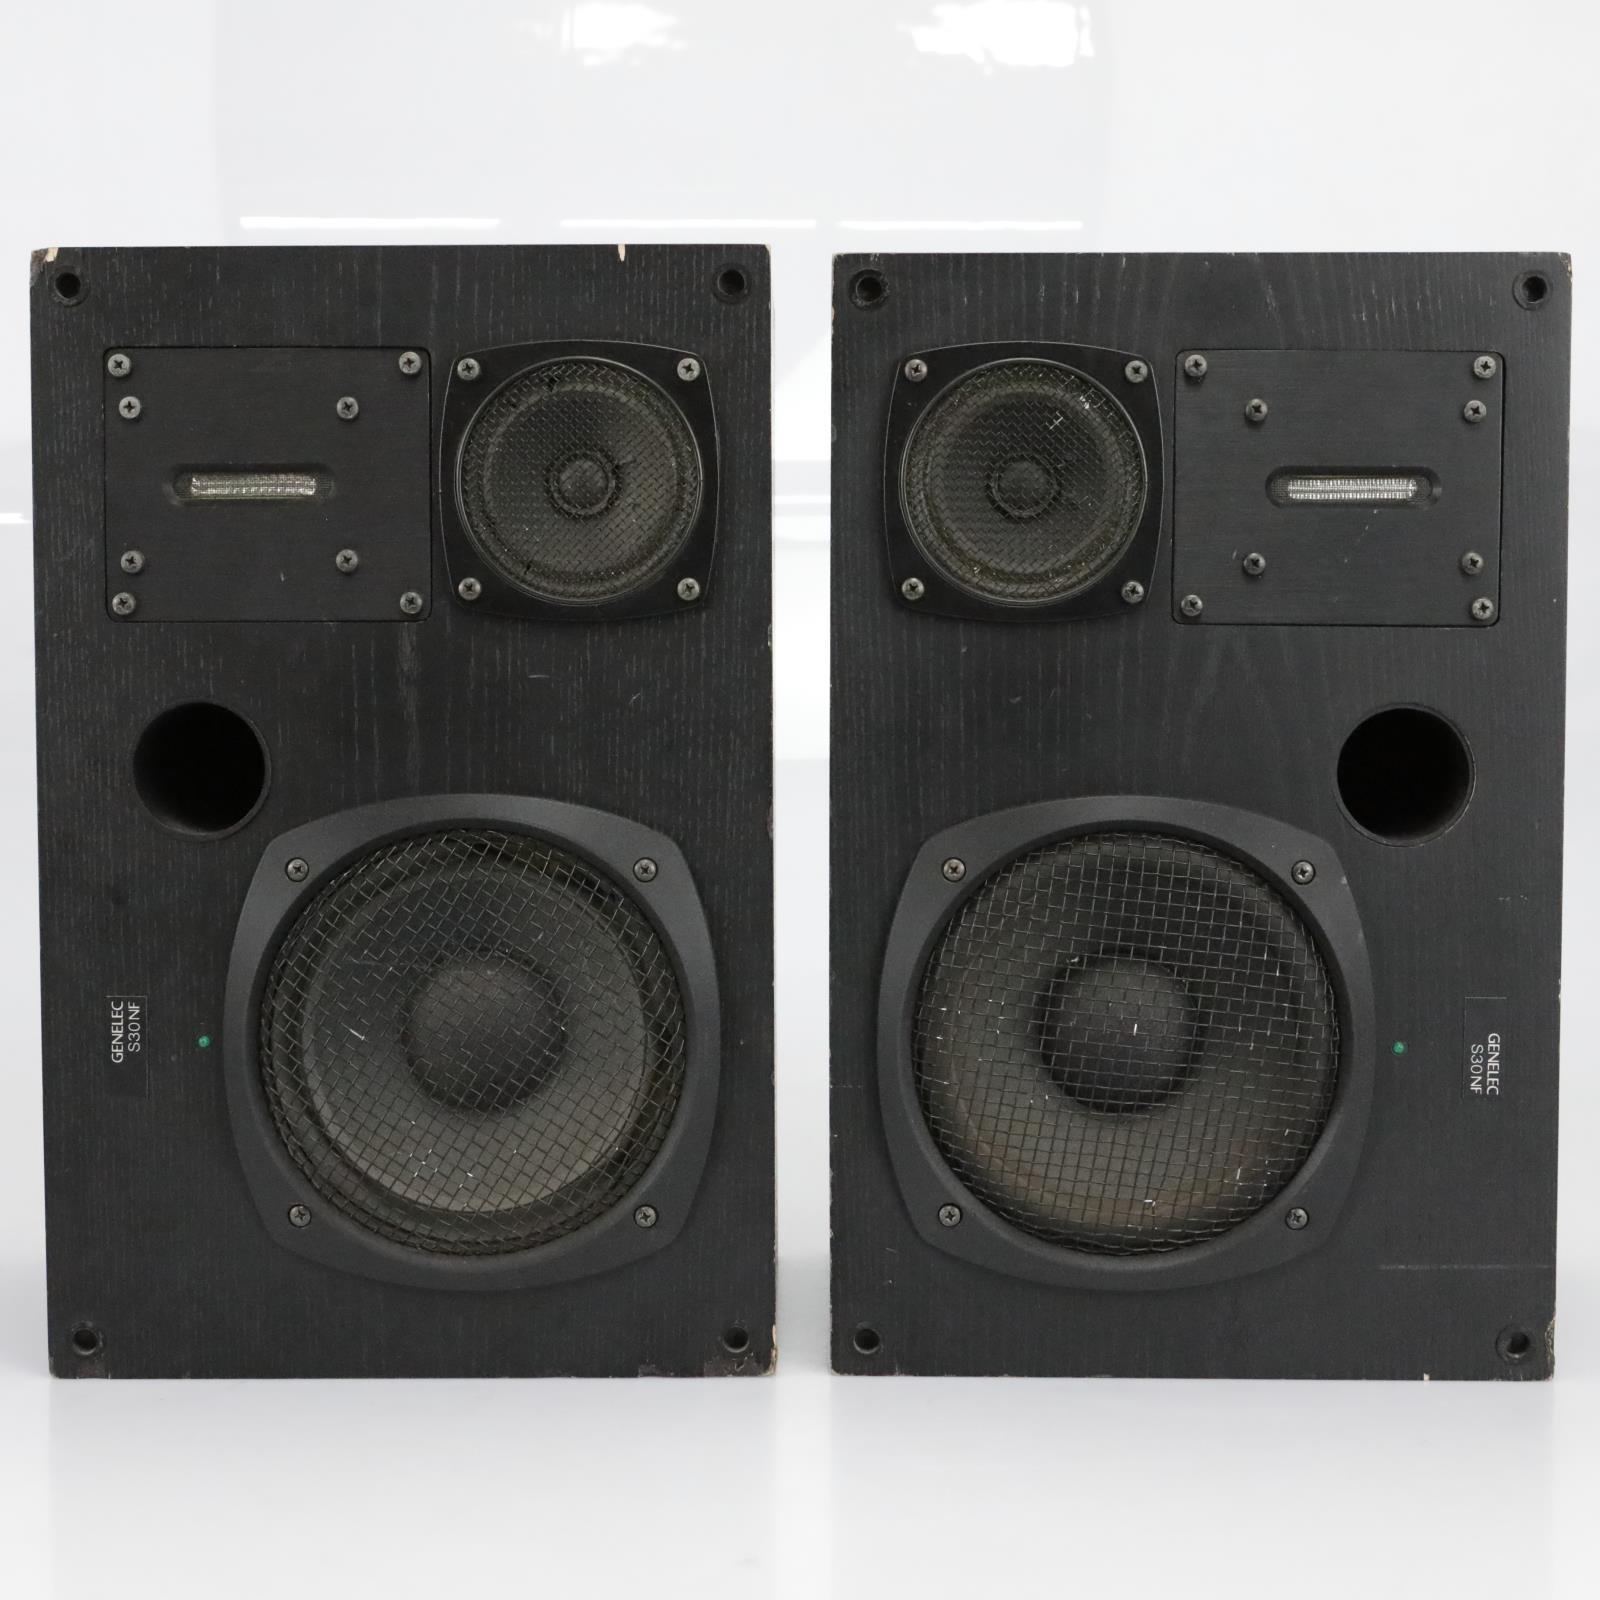 Genelec Triamp S30 NF Active Three-Way Studio Monitor Speakers S30NF #40317